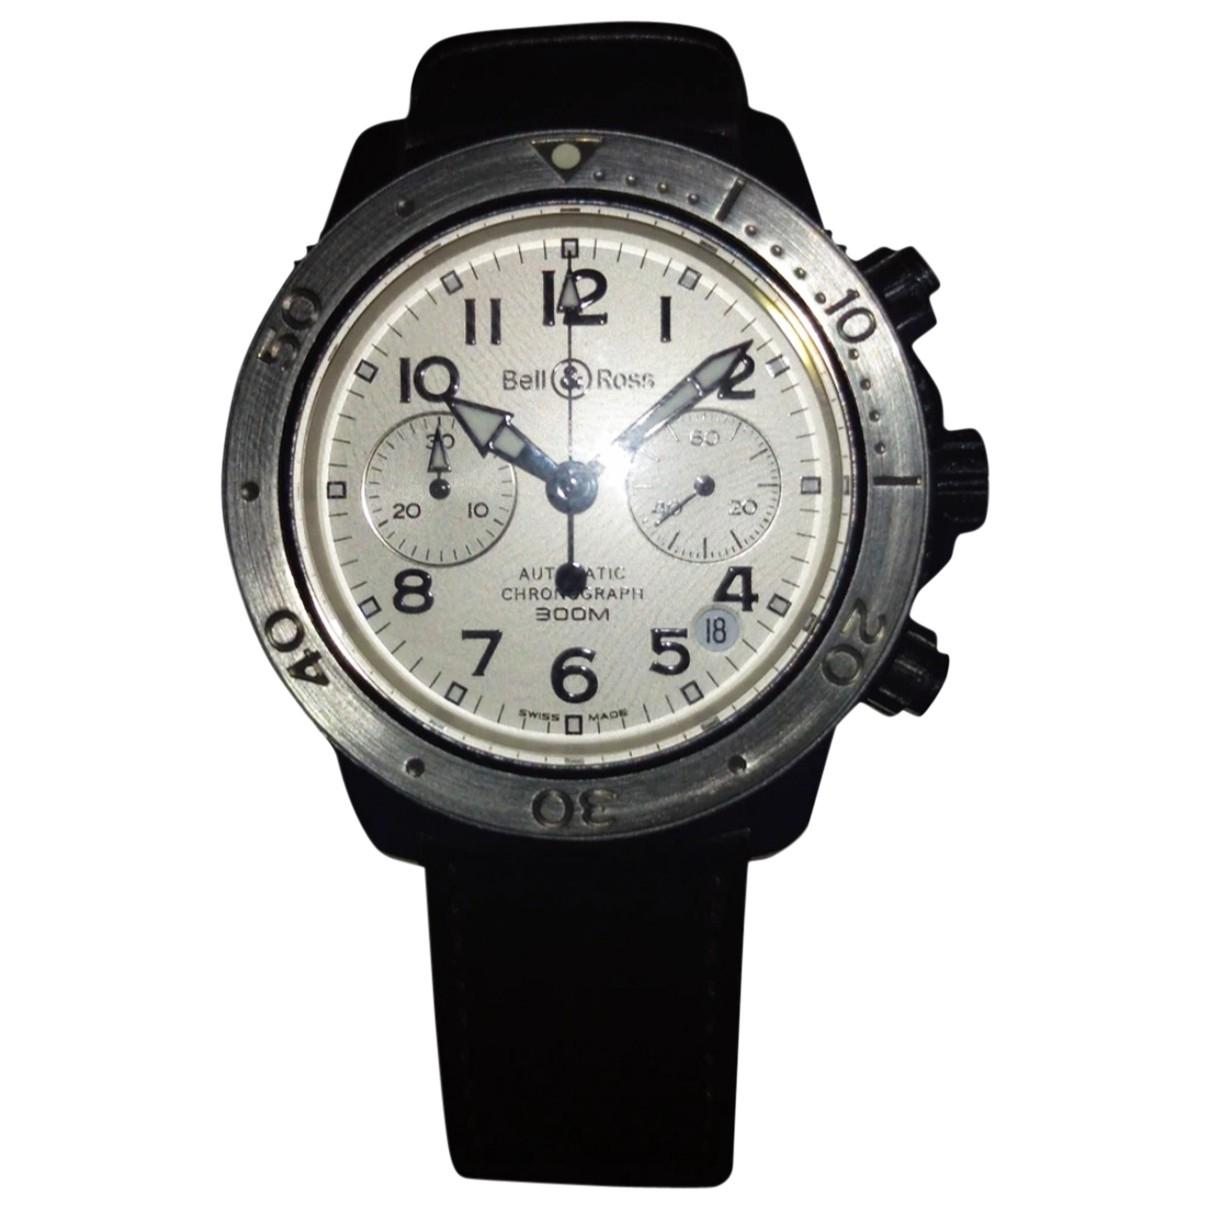 Bell & Ross N White Steel watch for Men N